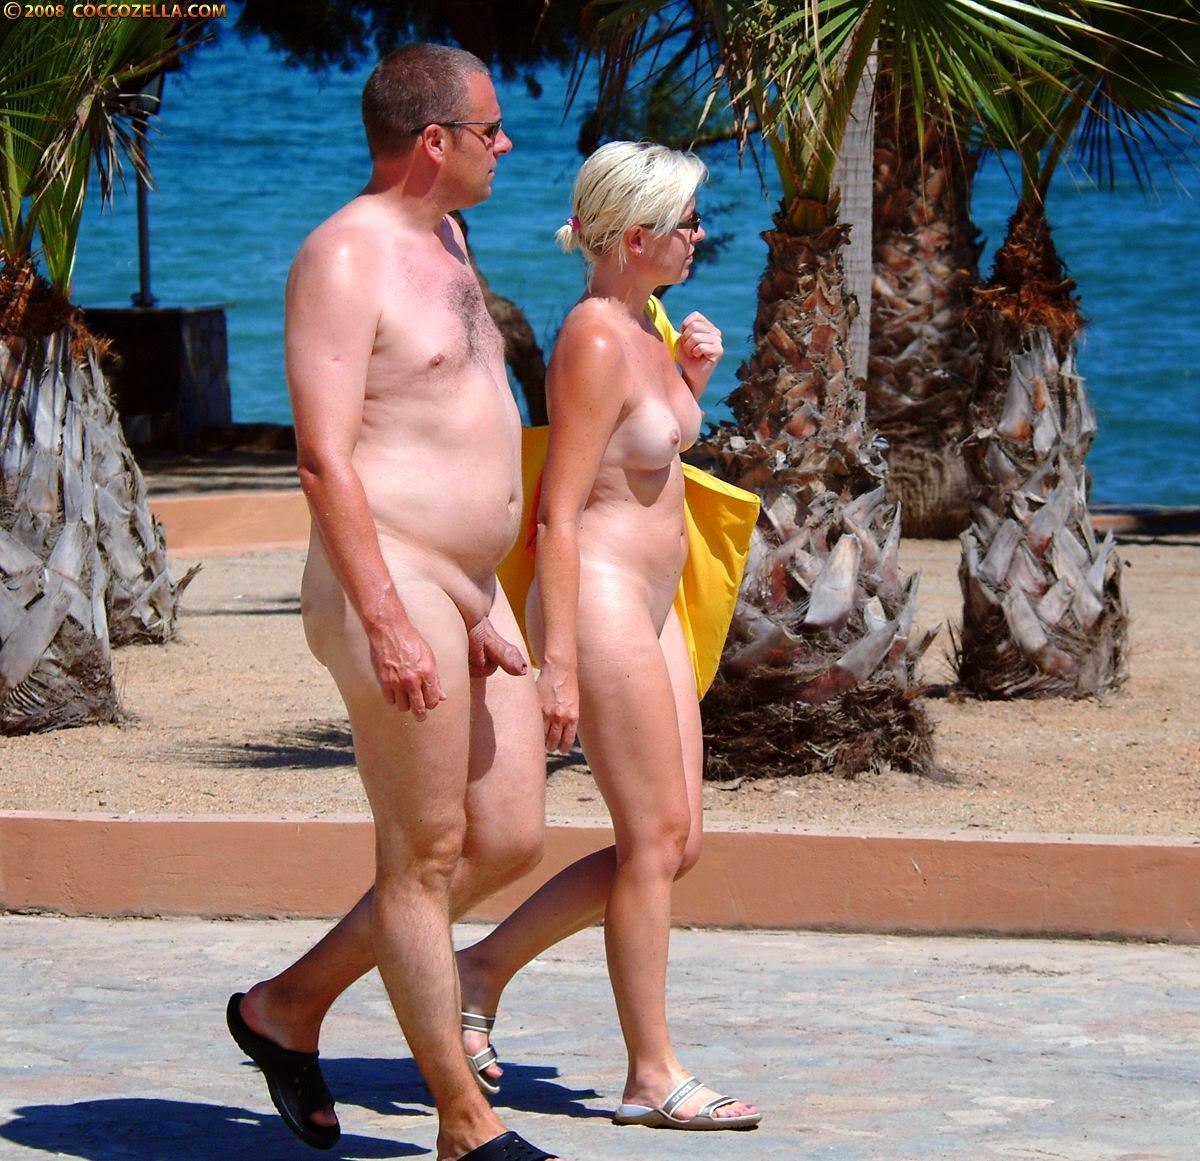 Beeg Nude Beach